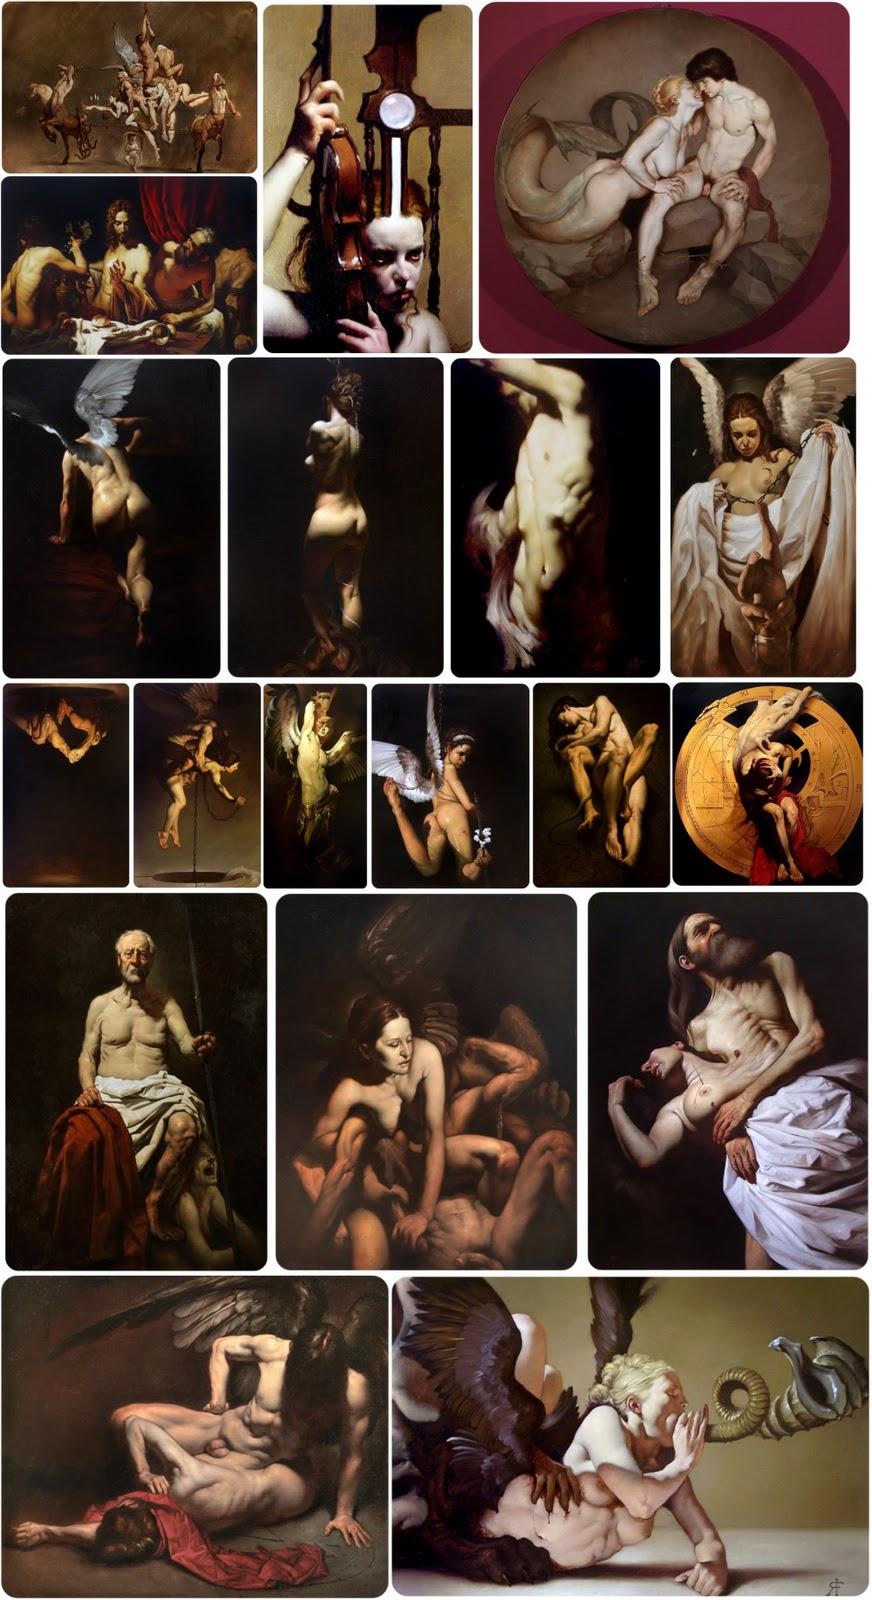 http://3.bp.blogspot.com/-rwygFknim5U/Tw9yf6wjp2I/AAAAAAAACak/Sbv6kRnXugs/s1600/roberto_ferri_painter.jpg